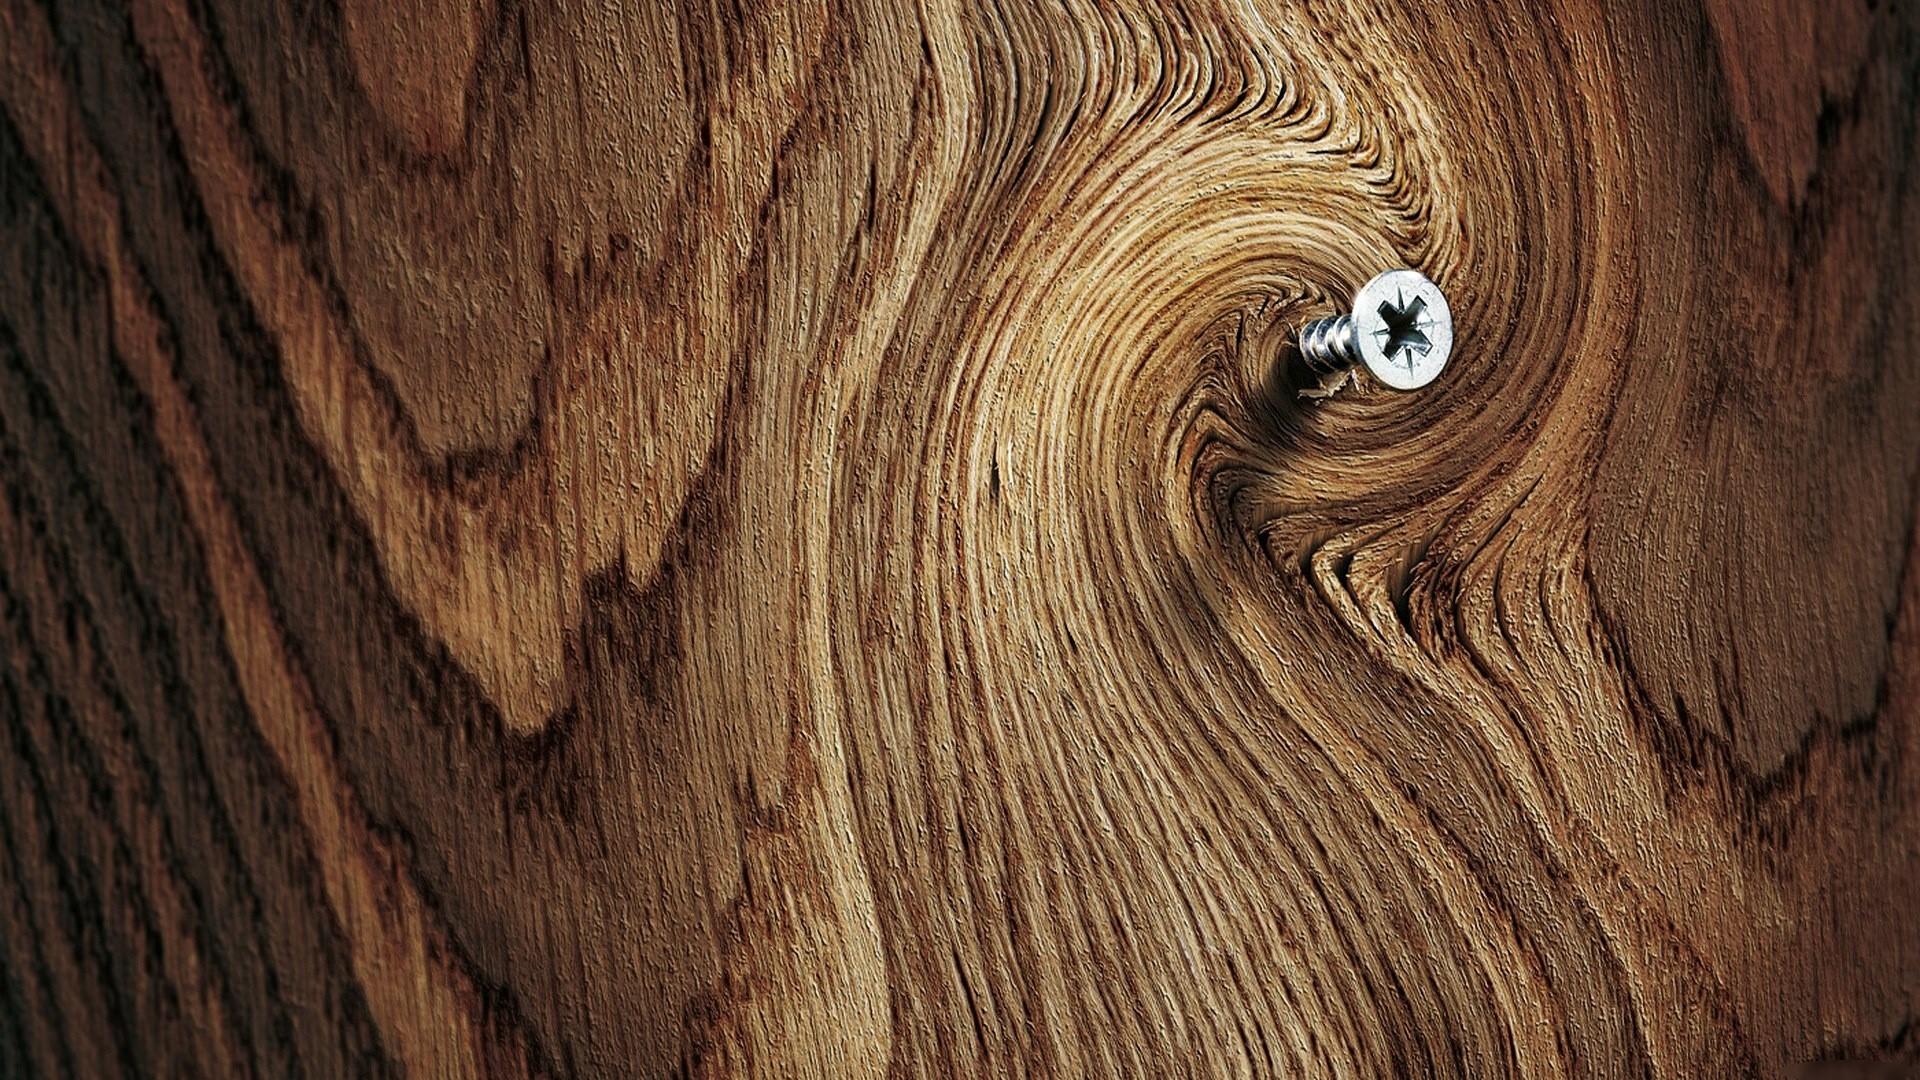 50 Hd Wood Wallpapers For Free Download: Wood Grain Wallpaper Hd